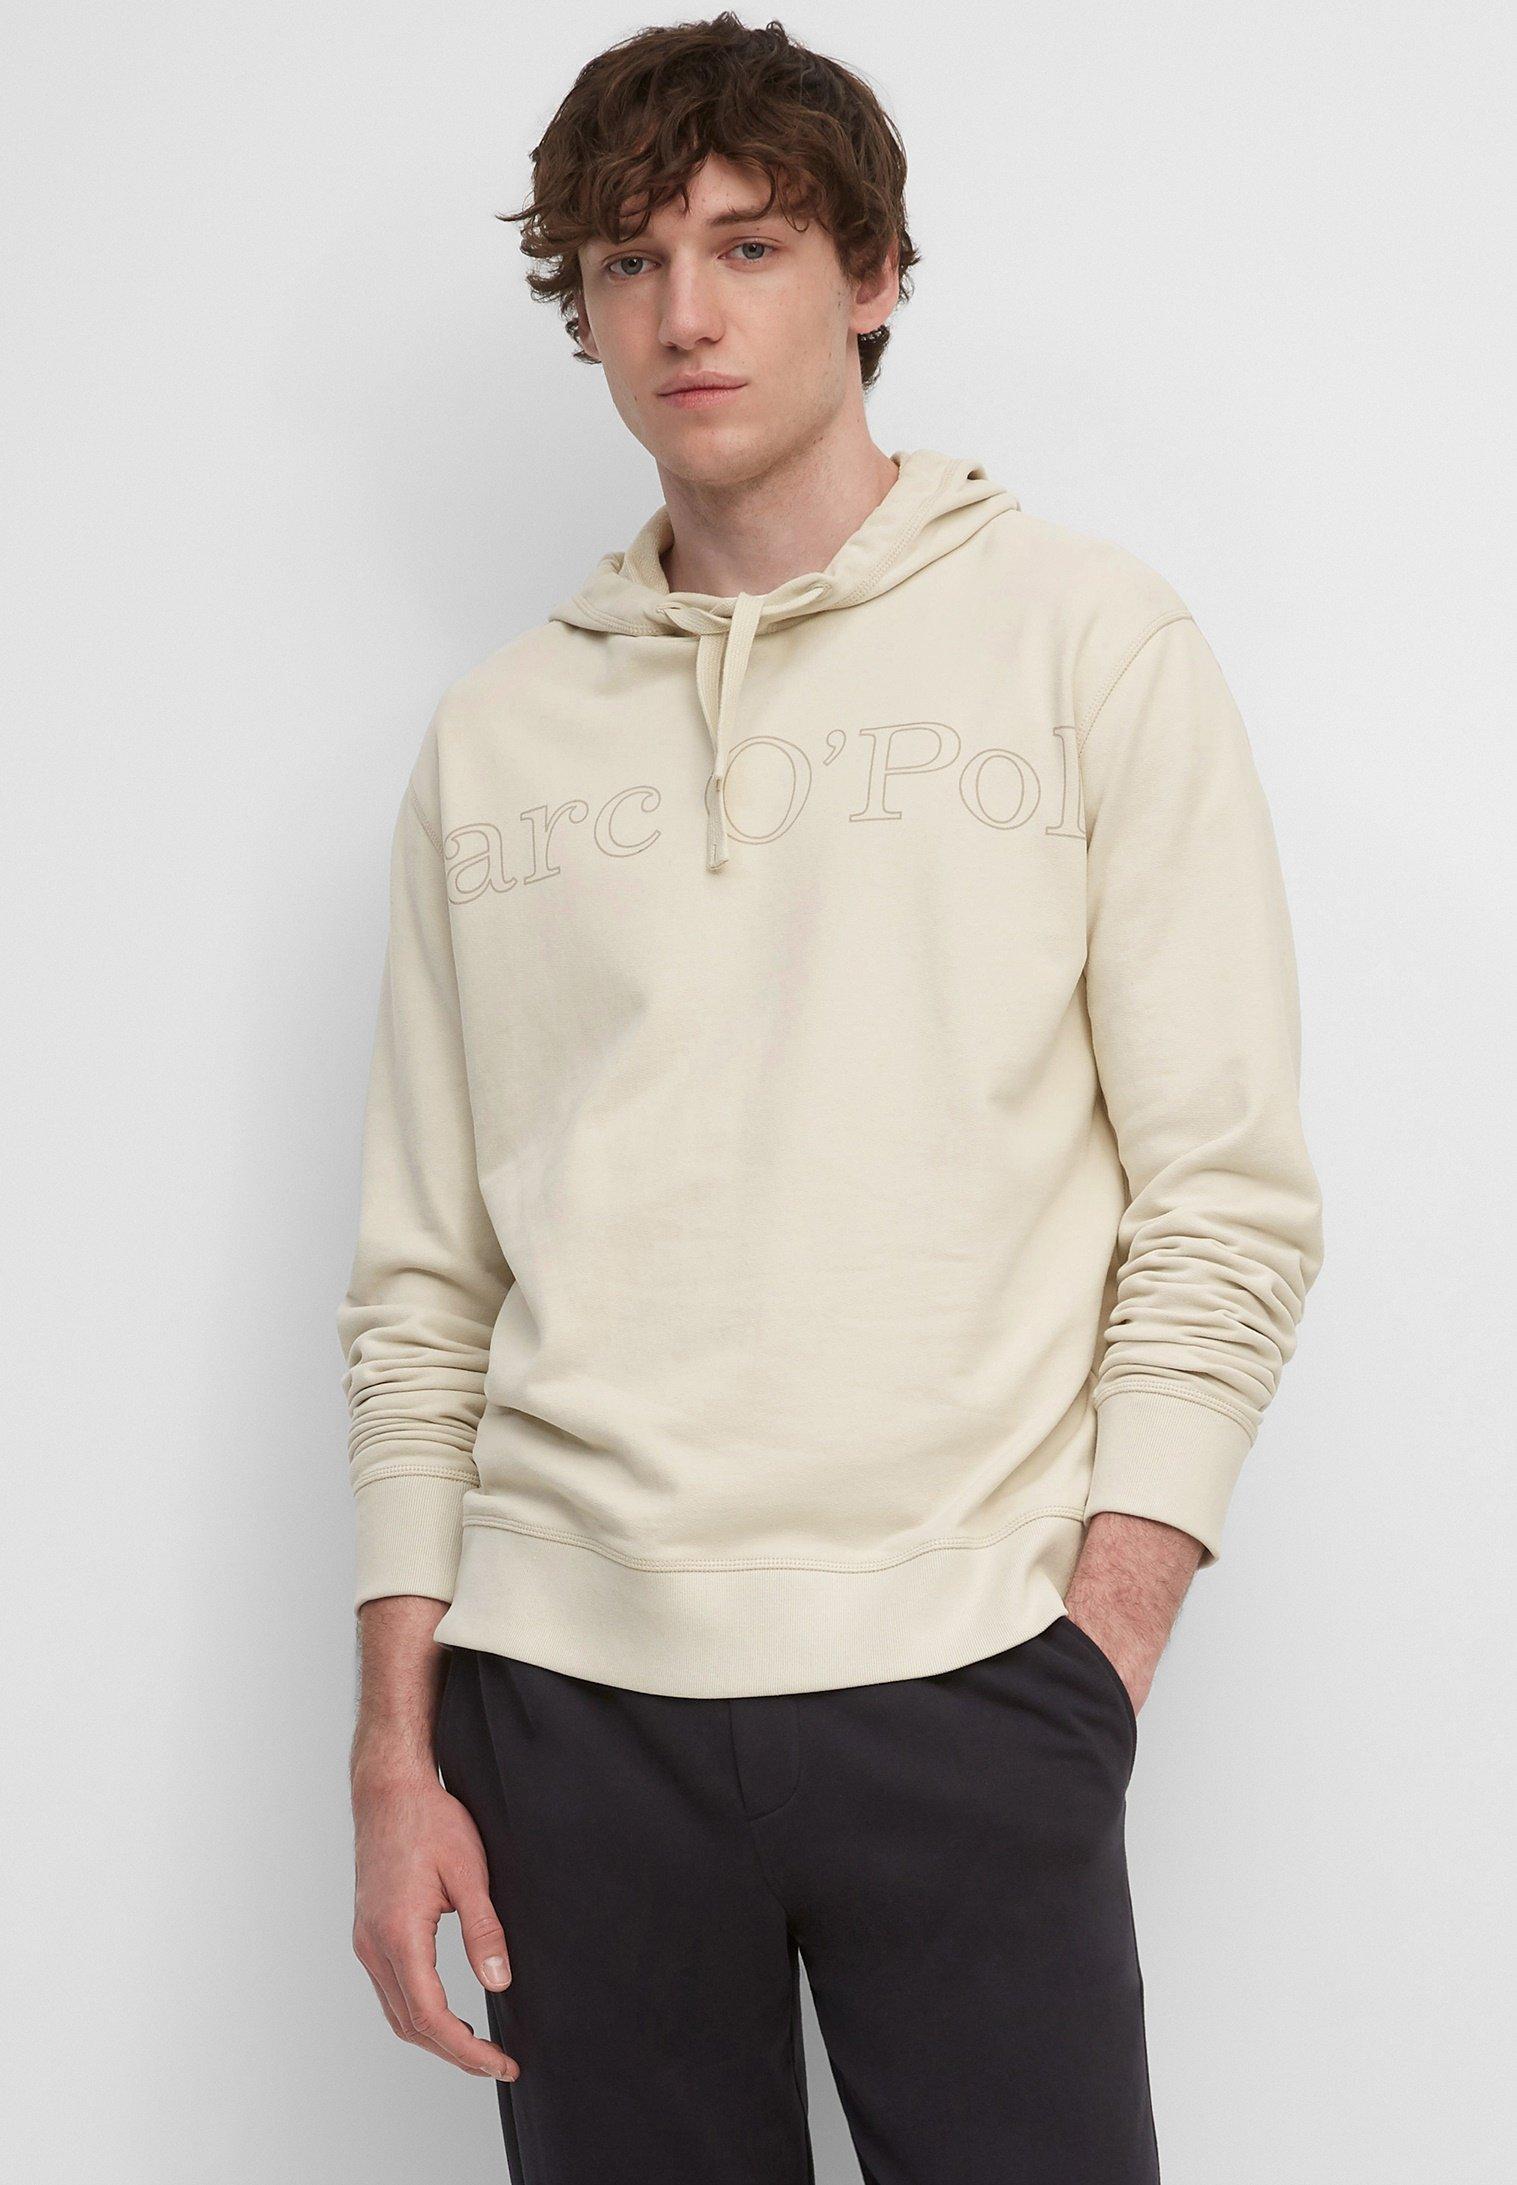 Herren FLATLOCK DETAILS, ARTWORK ON CHEST - Sweatshirt